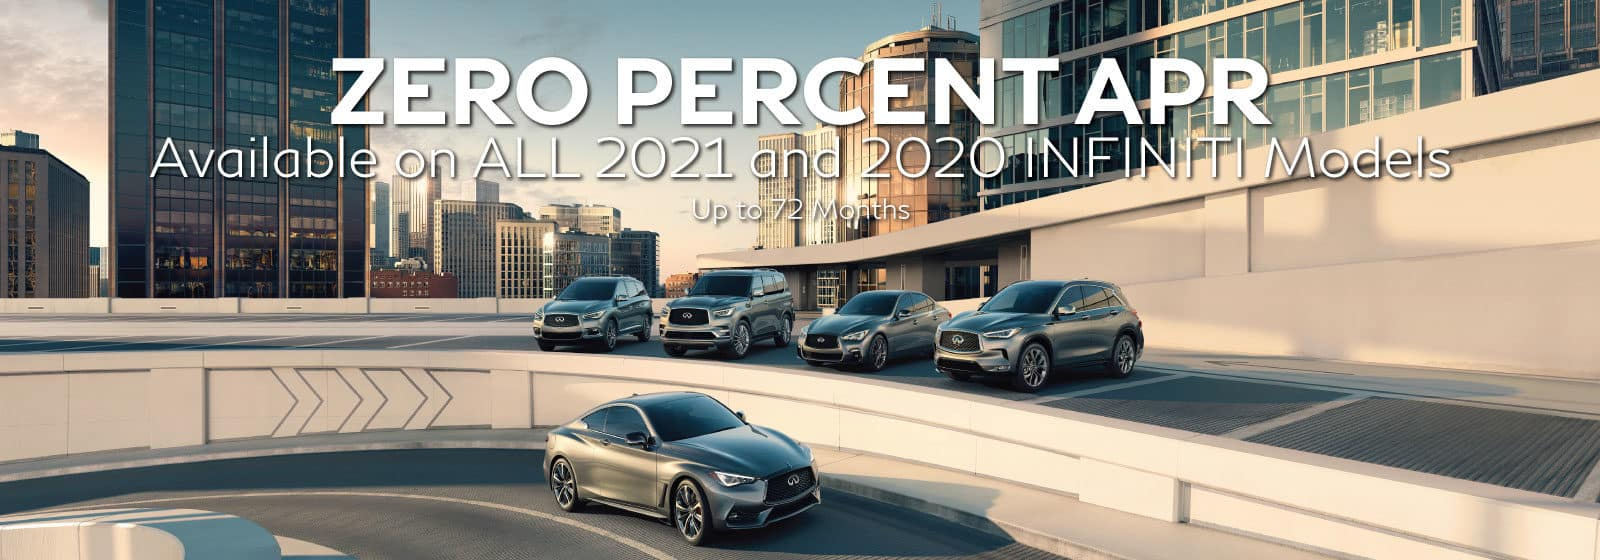 Zero Percent APR on all 2021 and 2020 INFINITI vehicles